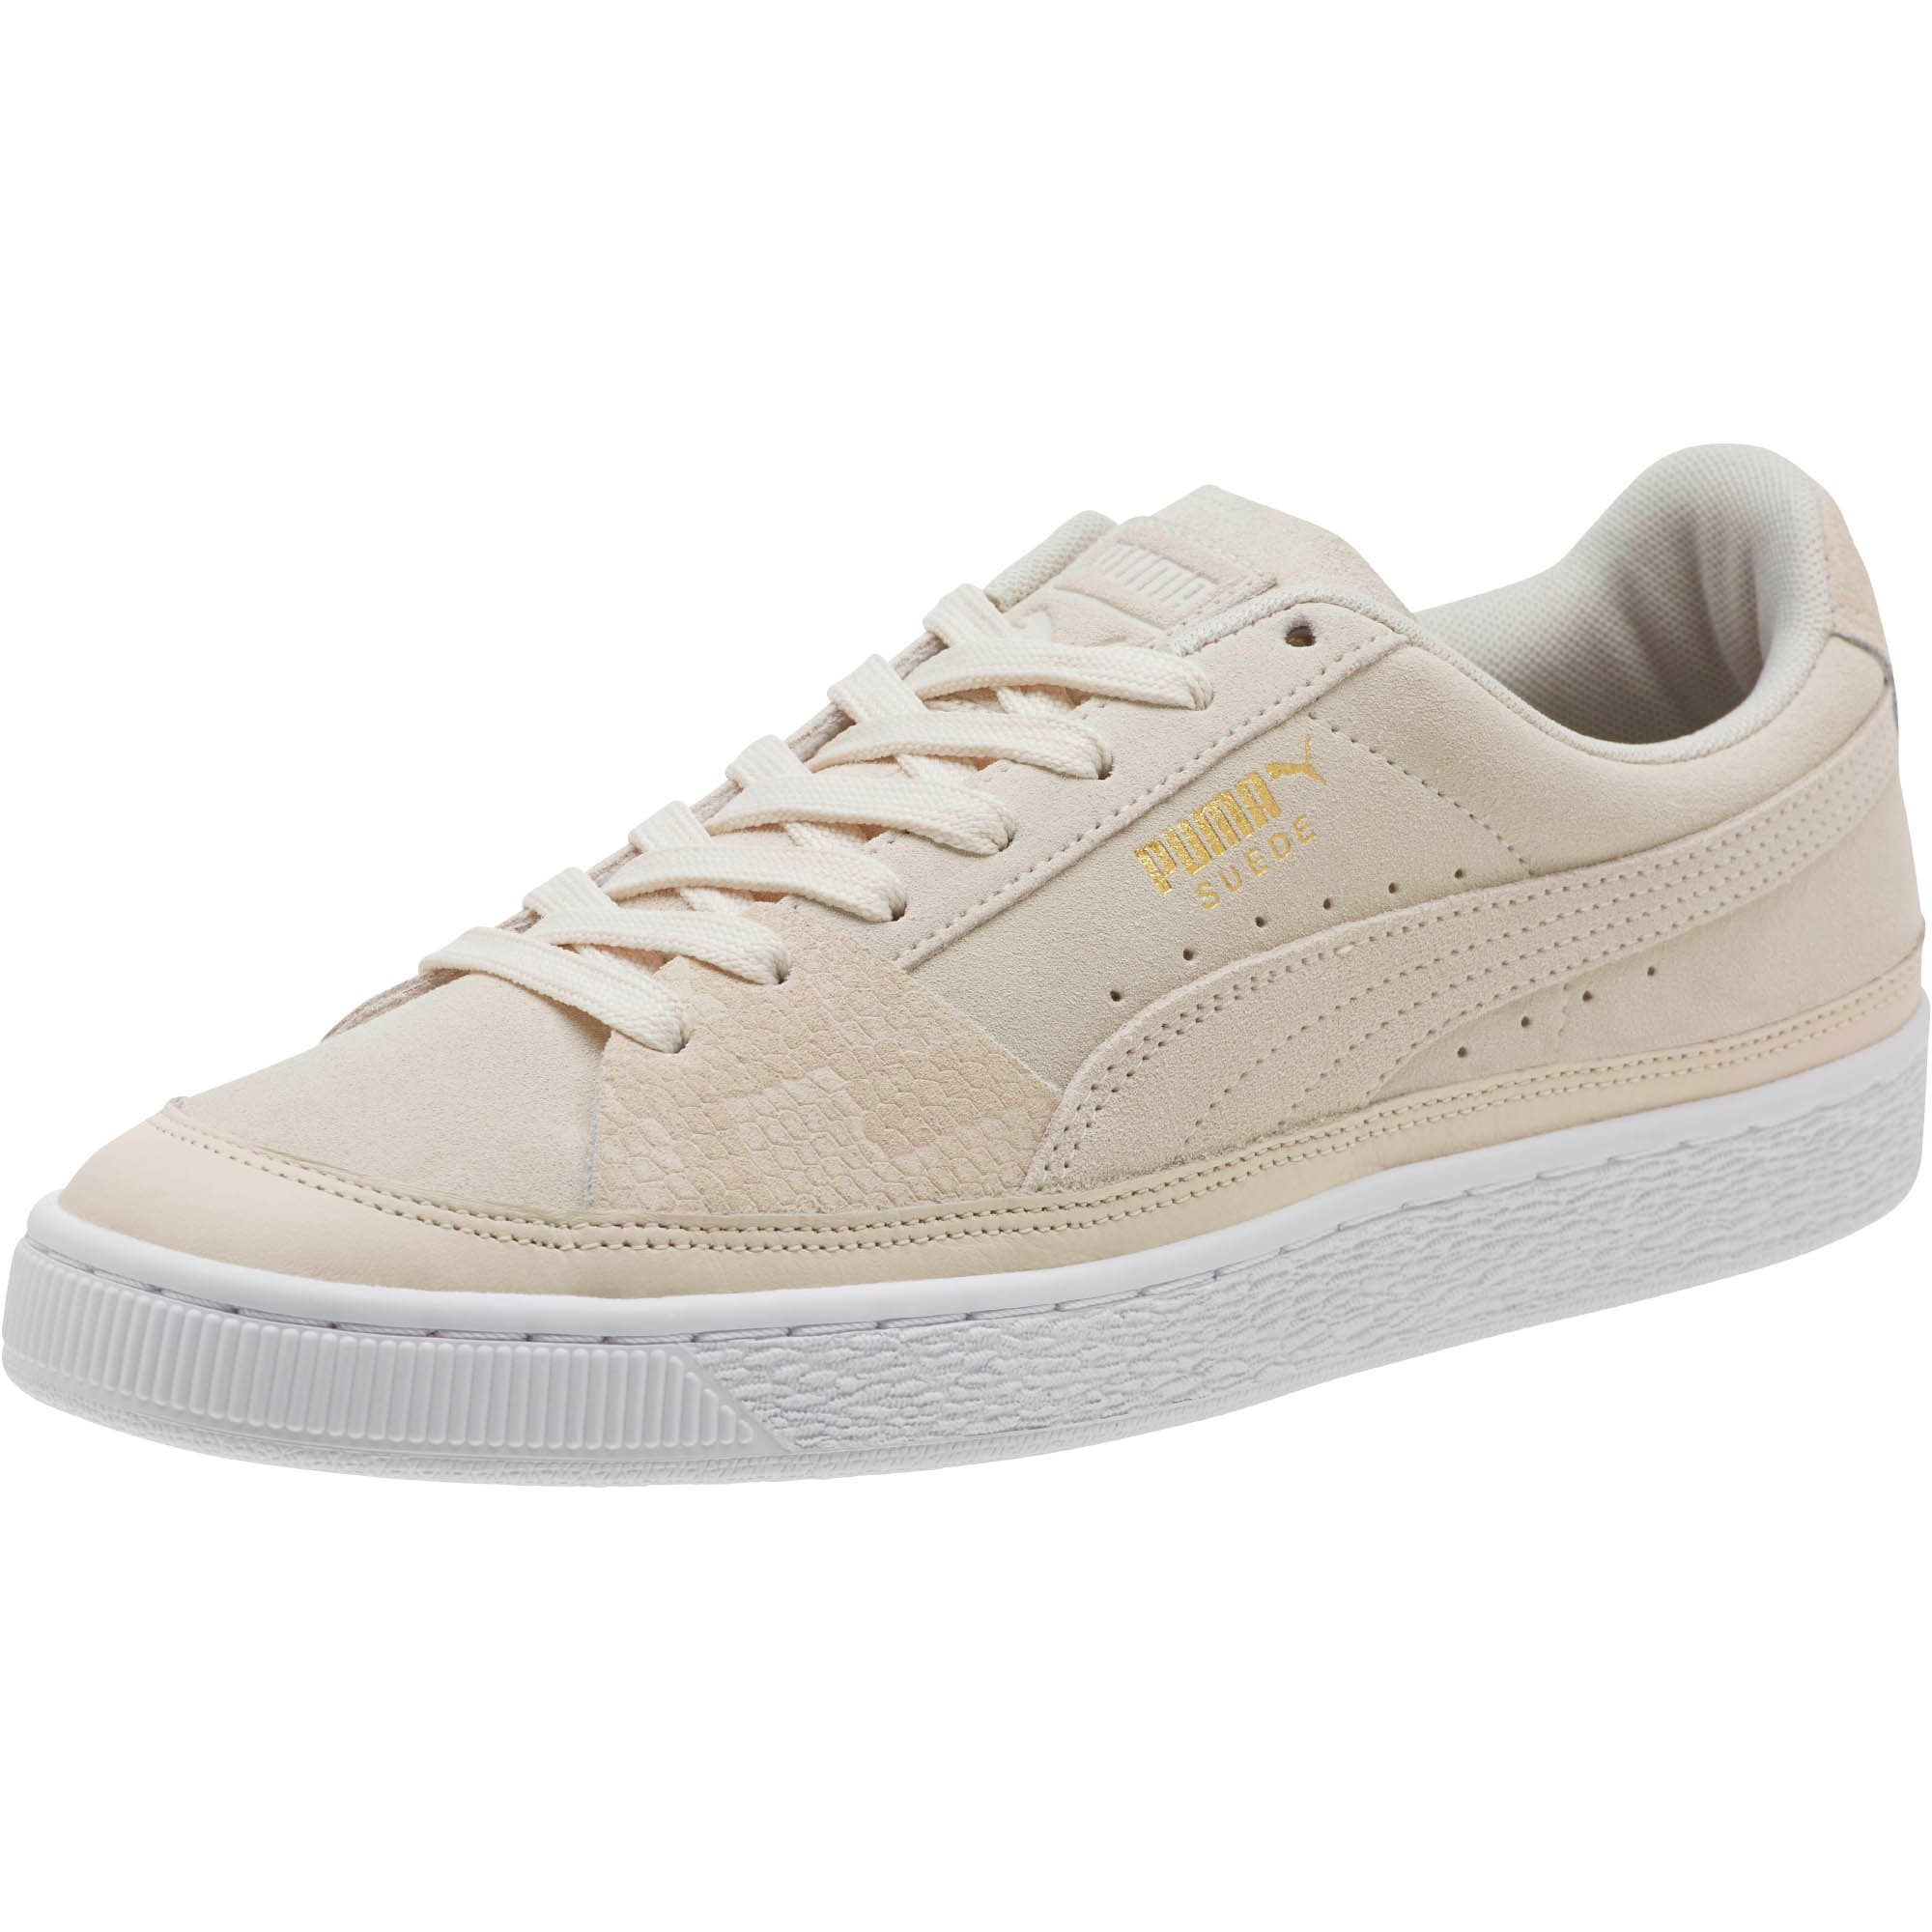 Thumbnail 1 of Suede Skate Premium Sneakers, Whisper White-Puma White, medium